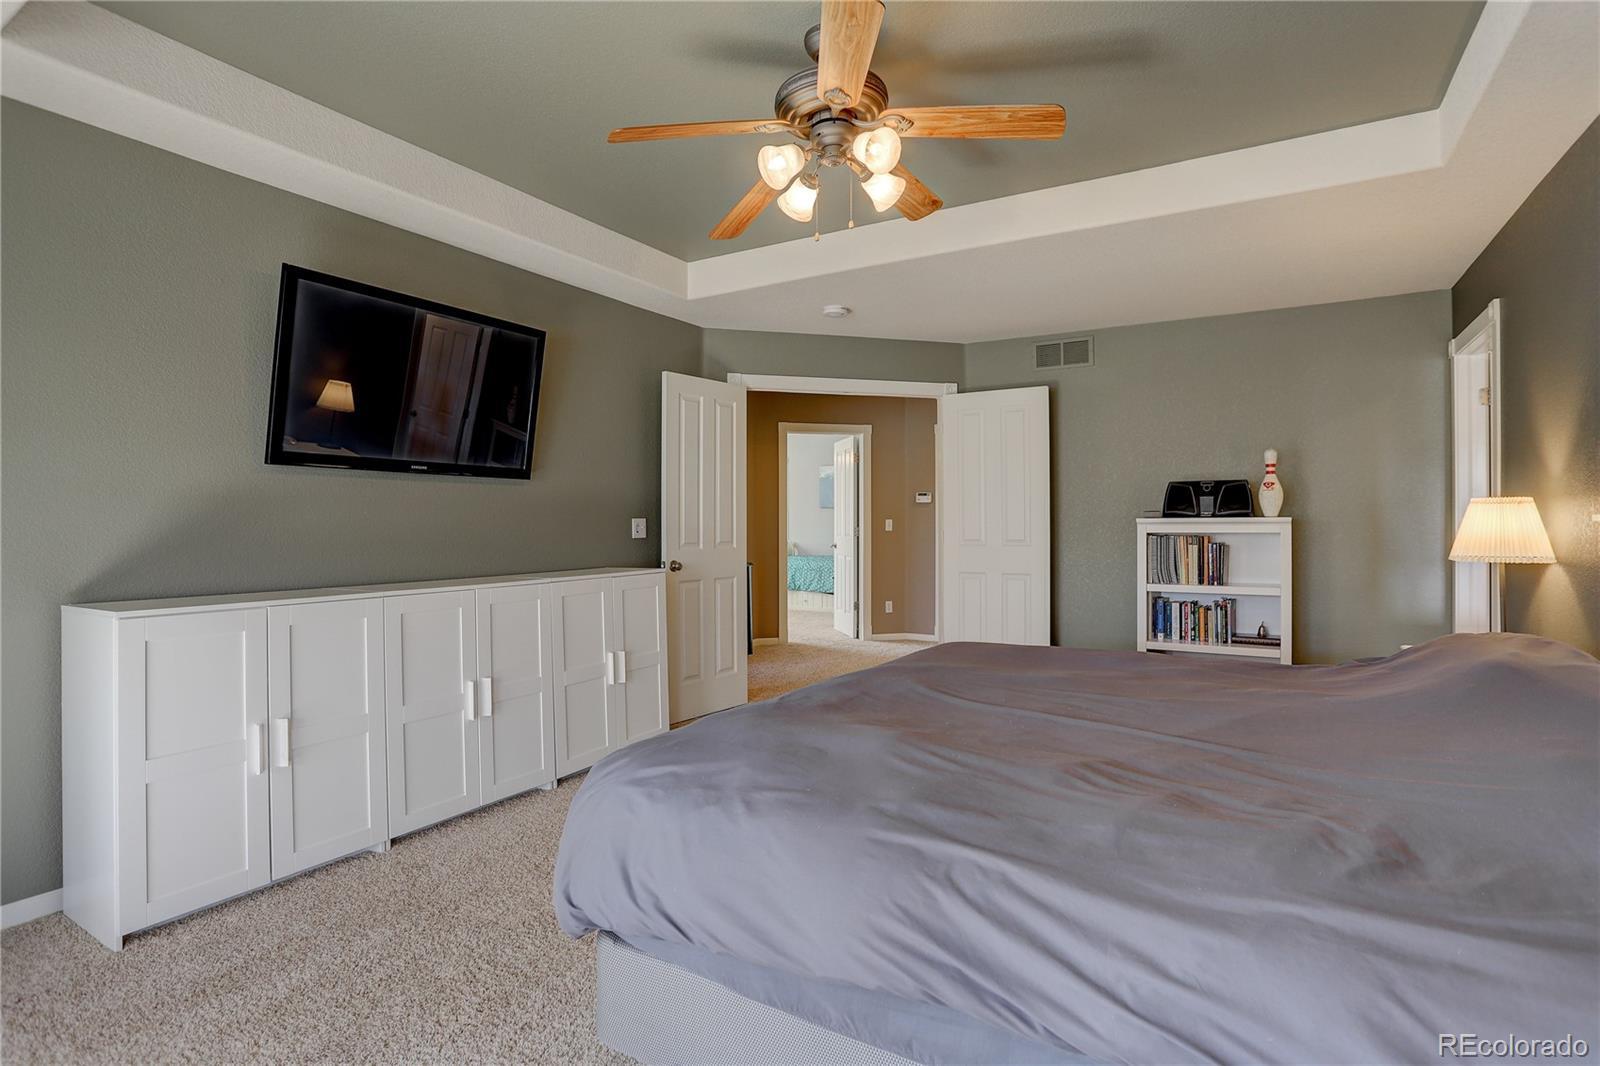 MLS# 3656997 - 13 - 10670 Addison Court, Highlands Ranch, CO 80126